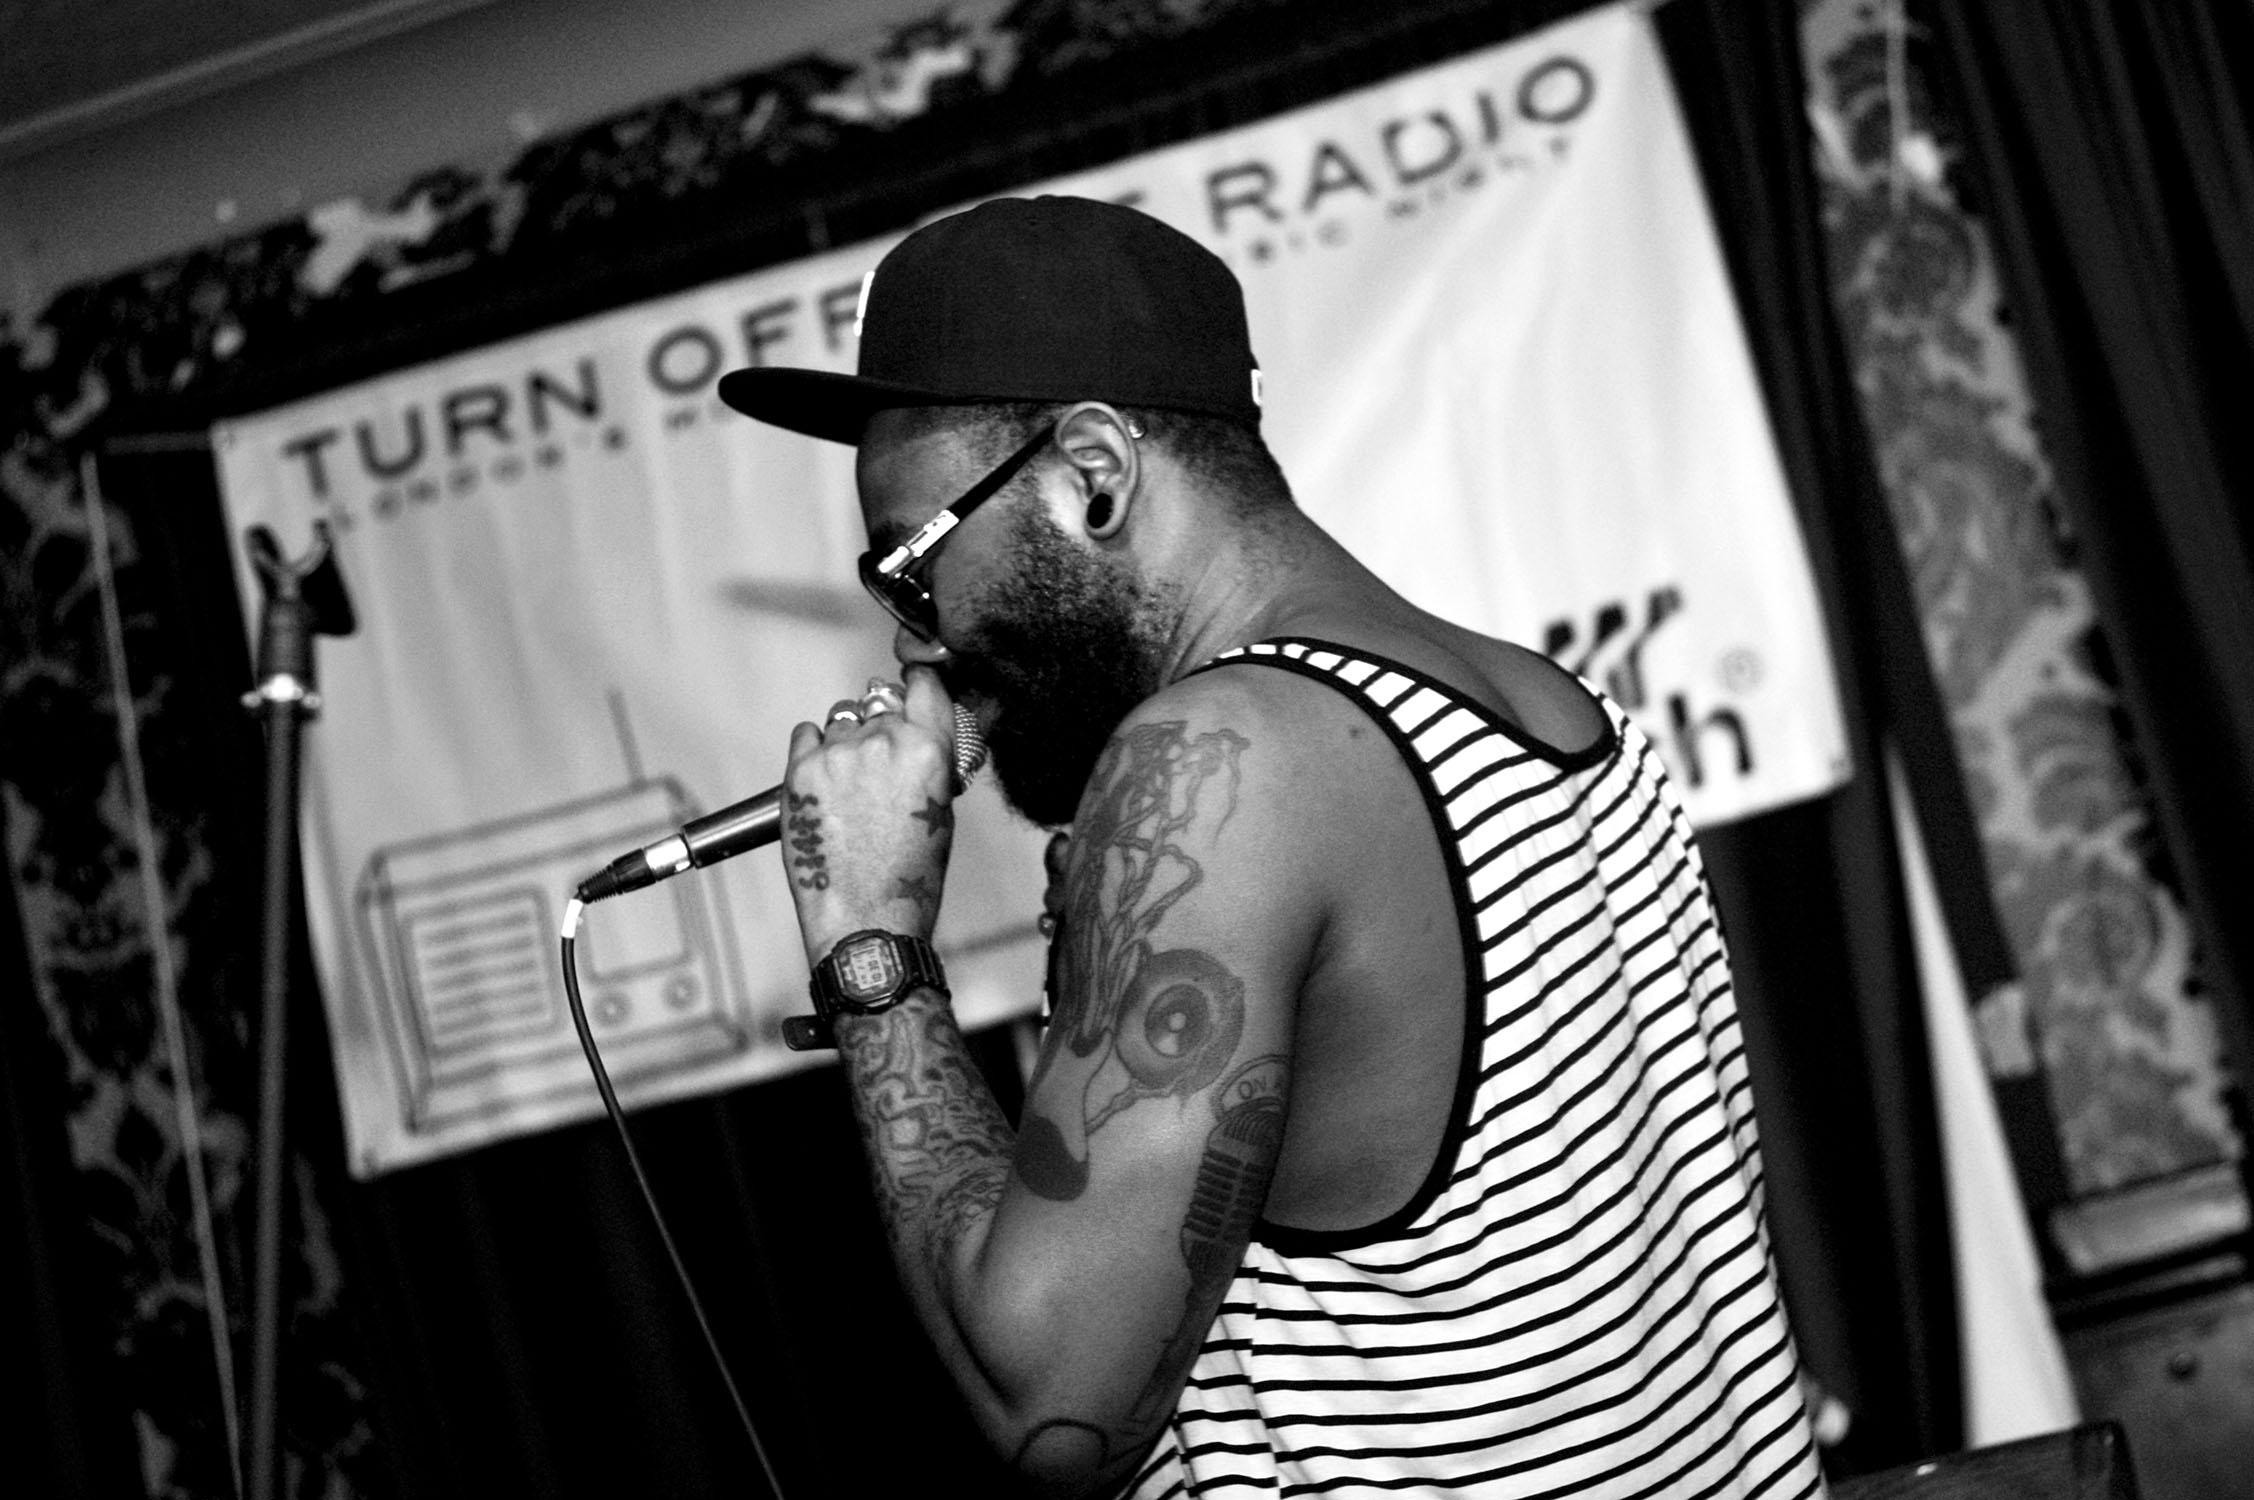 Turn Off The Radio Event